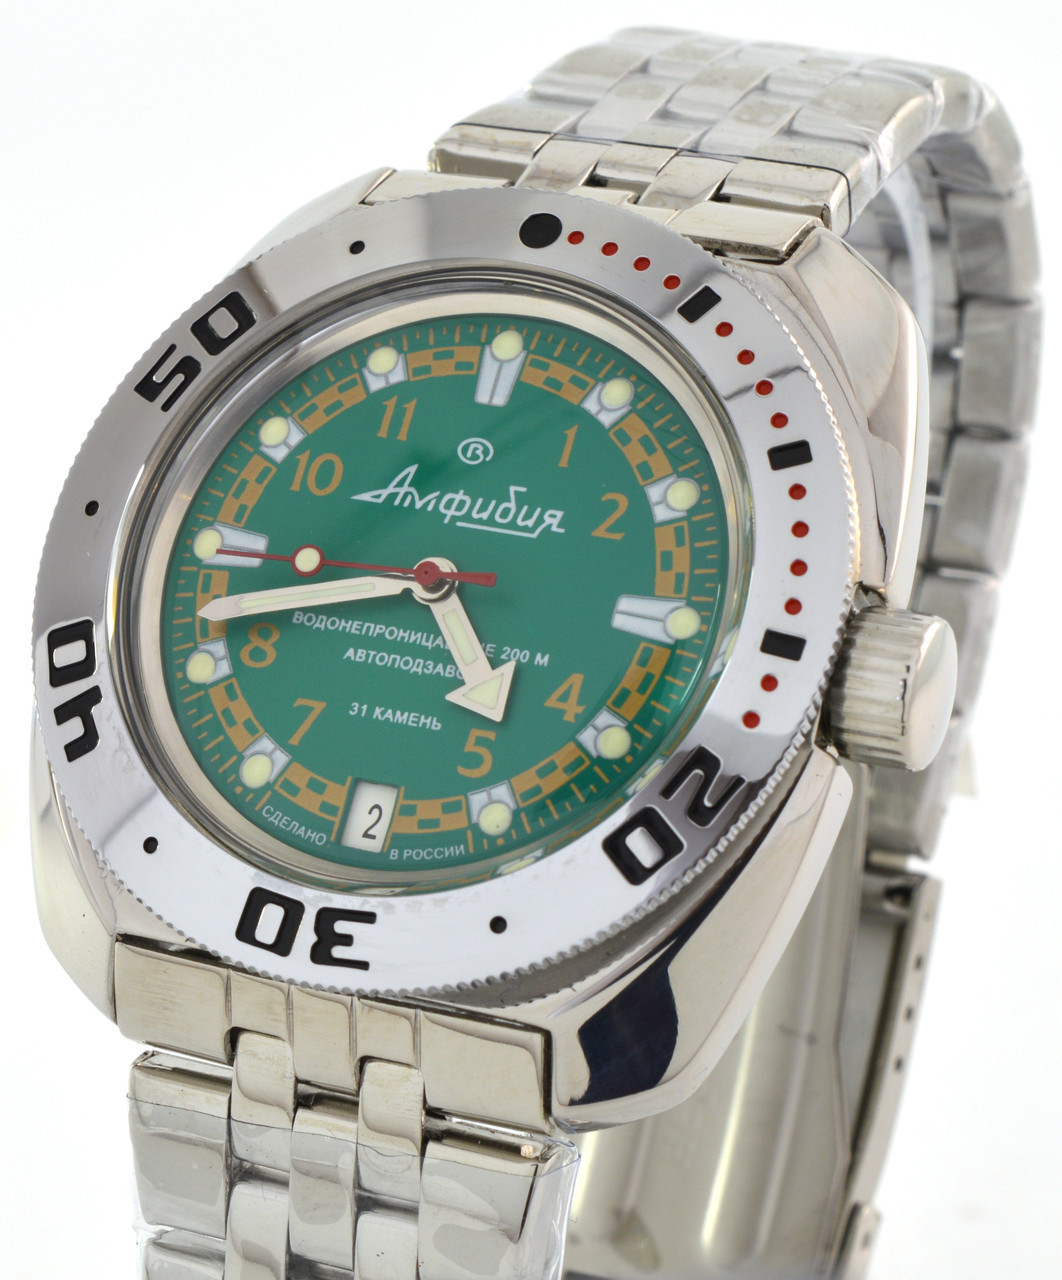 a6d1d6bc9250 Мужские часы Восток Амфибия 710439 - Интернет-магазин